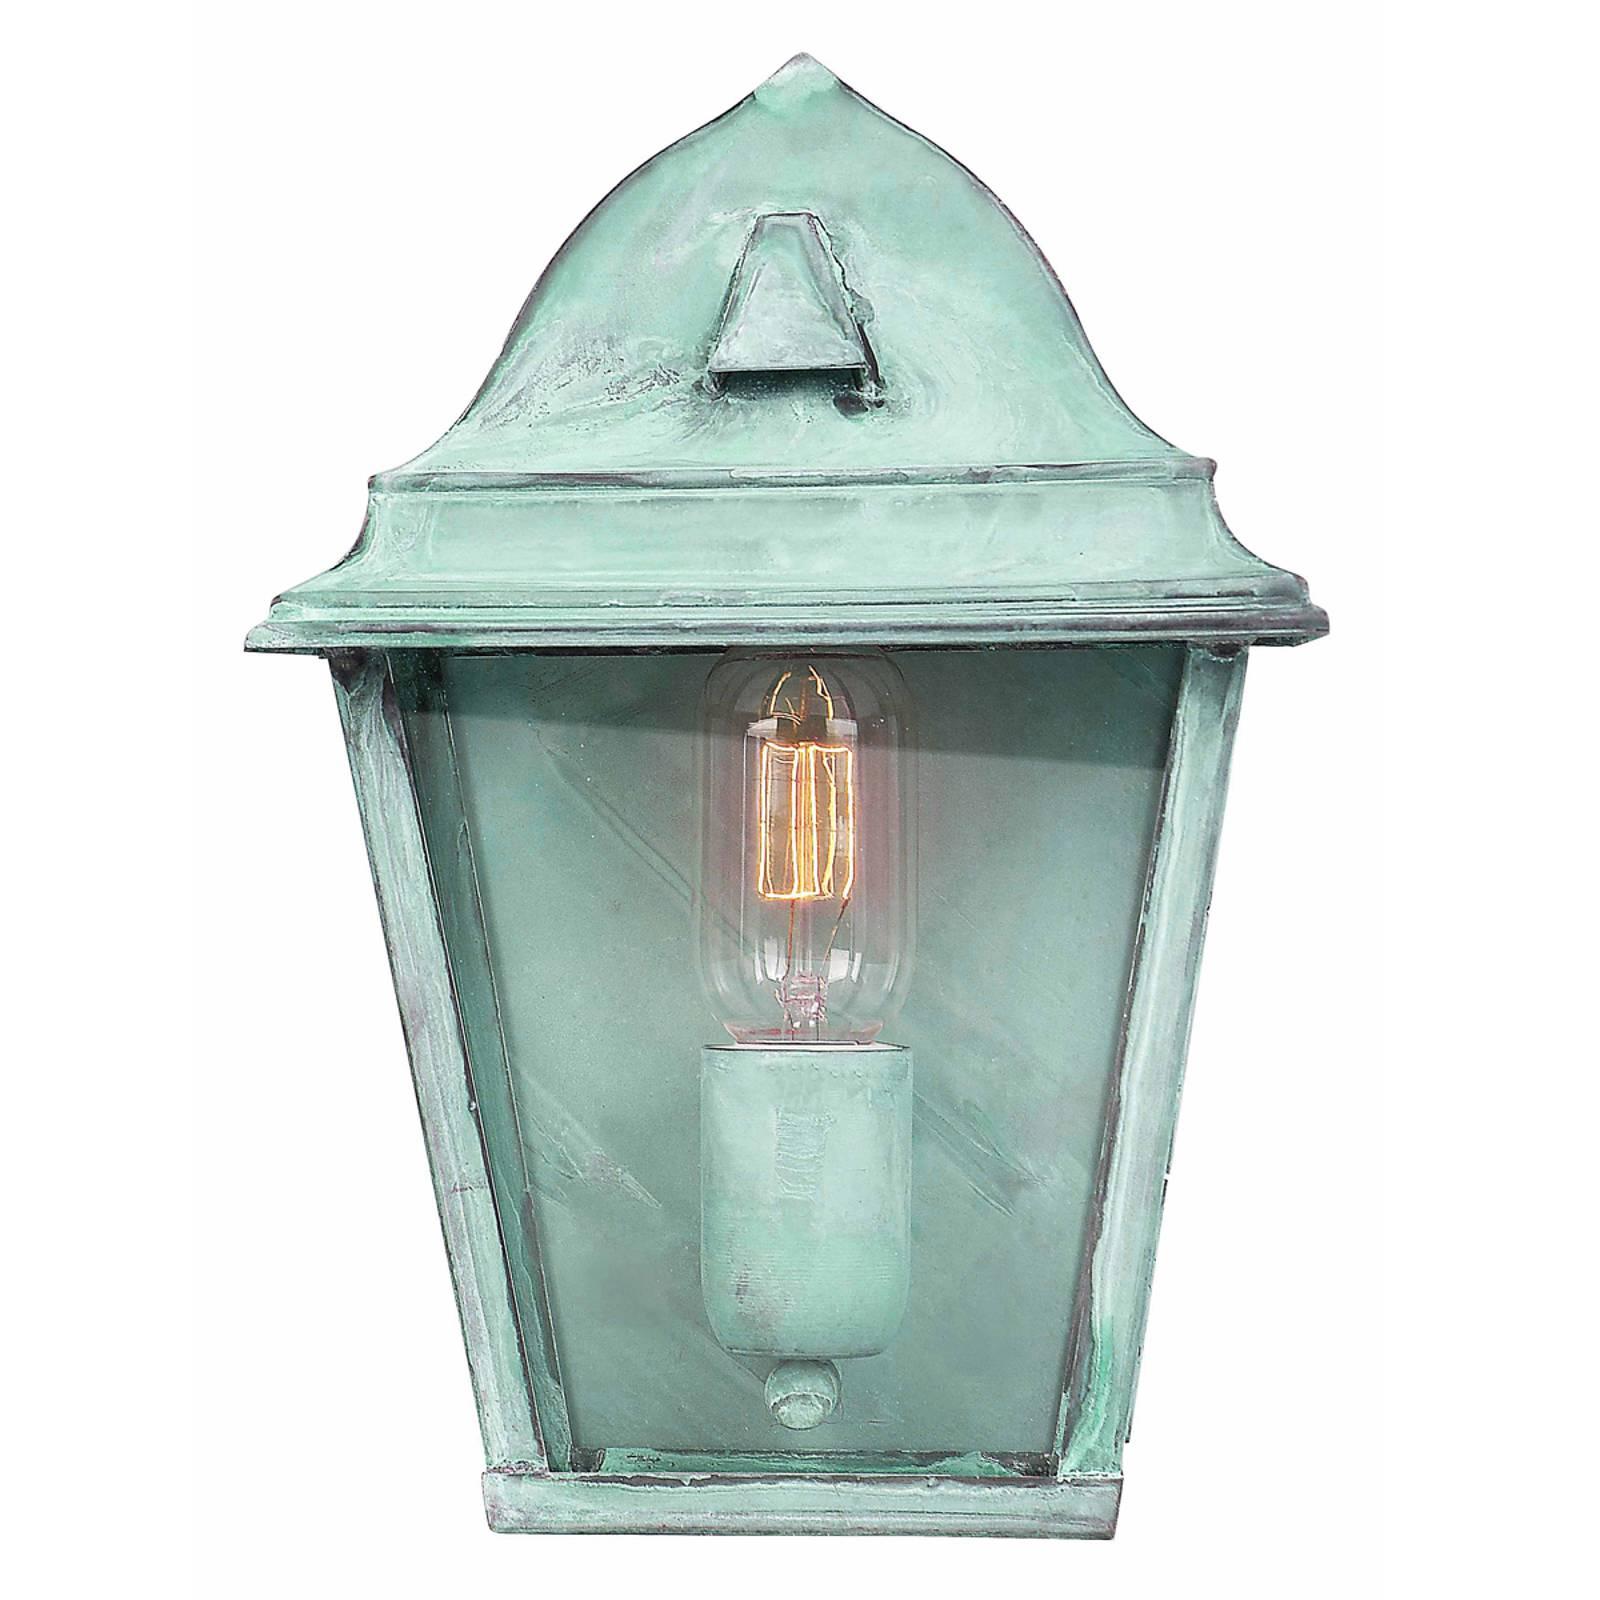 Groene buitenwandlamp St. James Verdi van messing